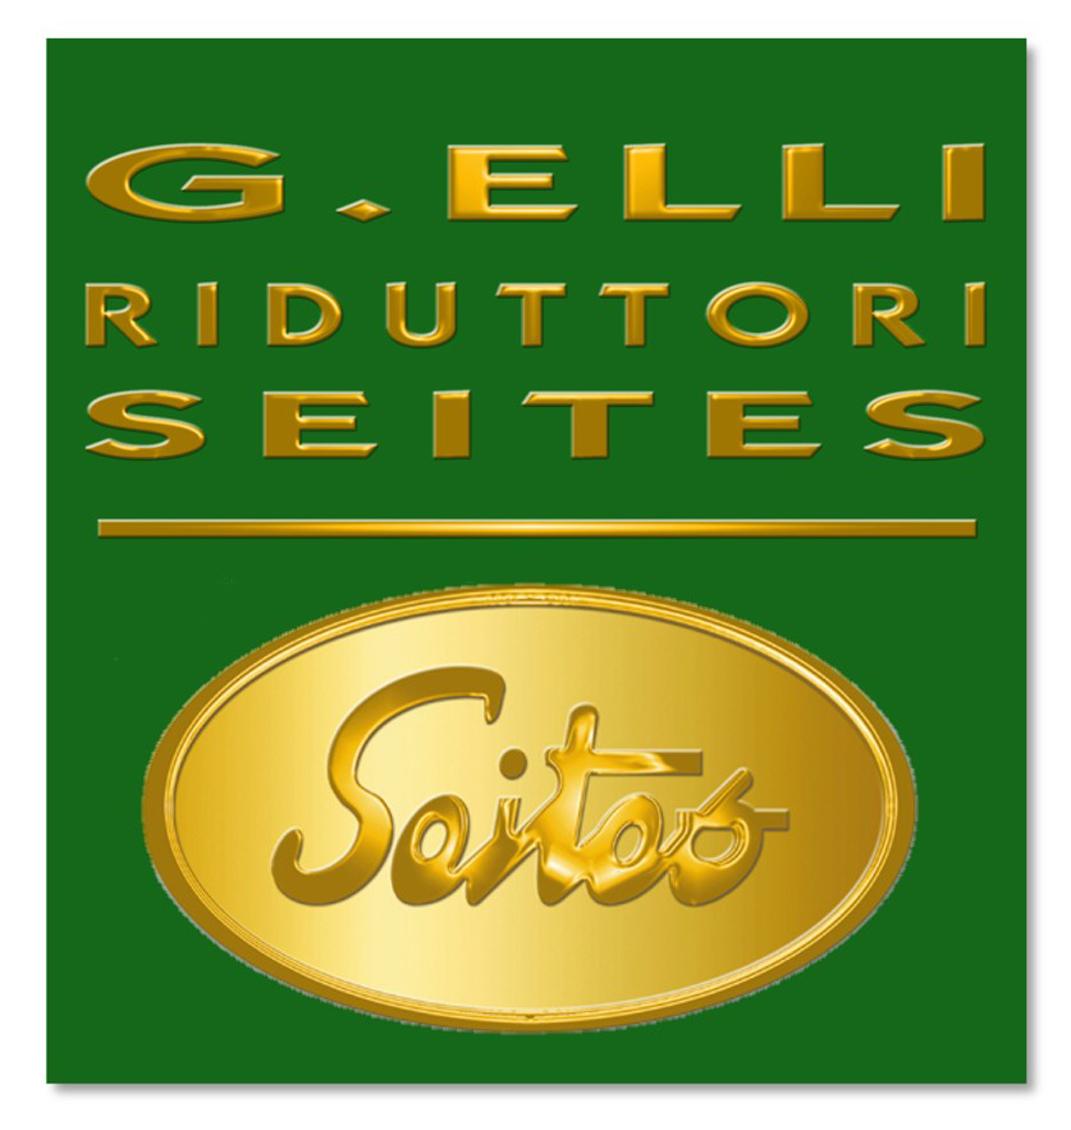 g-elli-riduttori-seites-spa